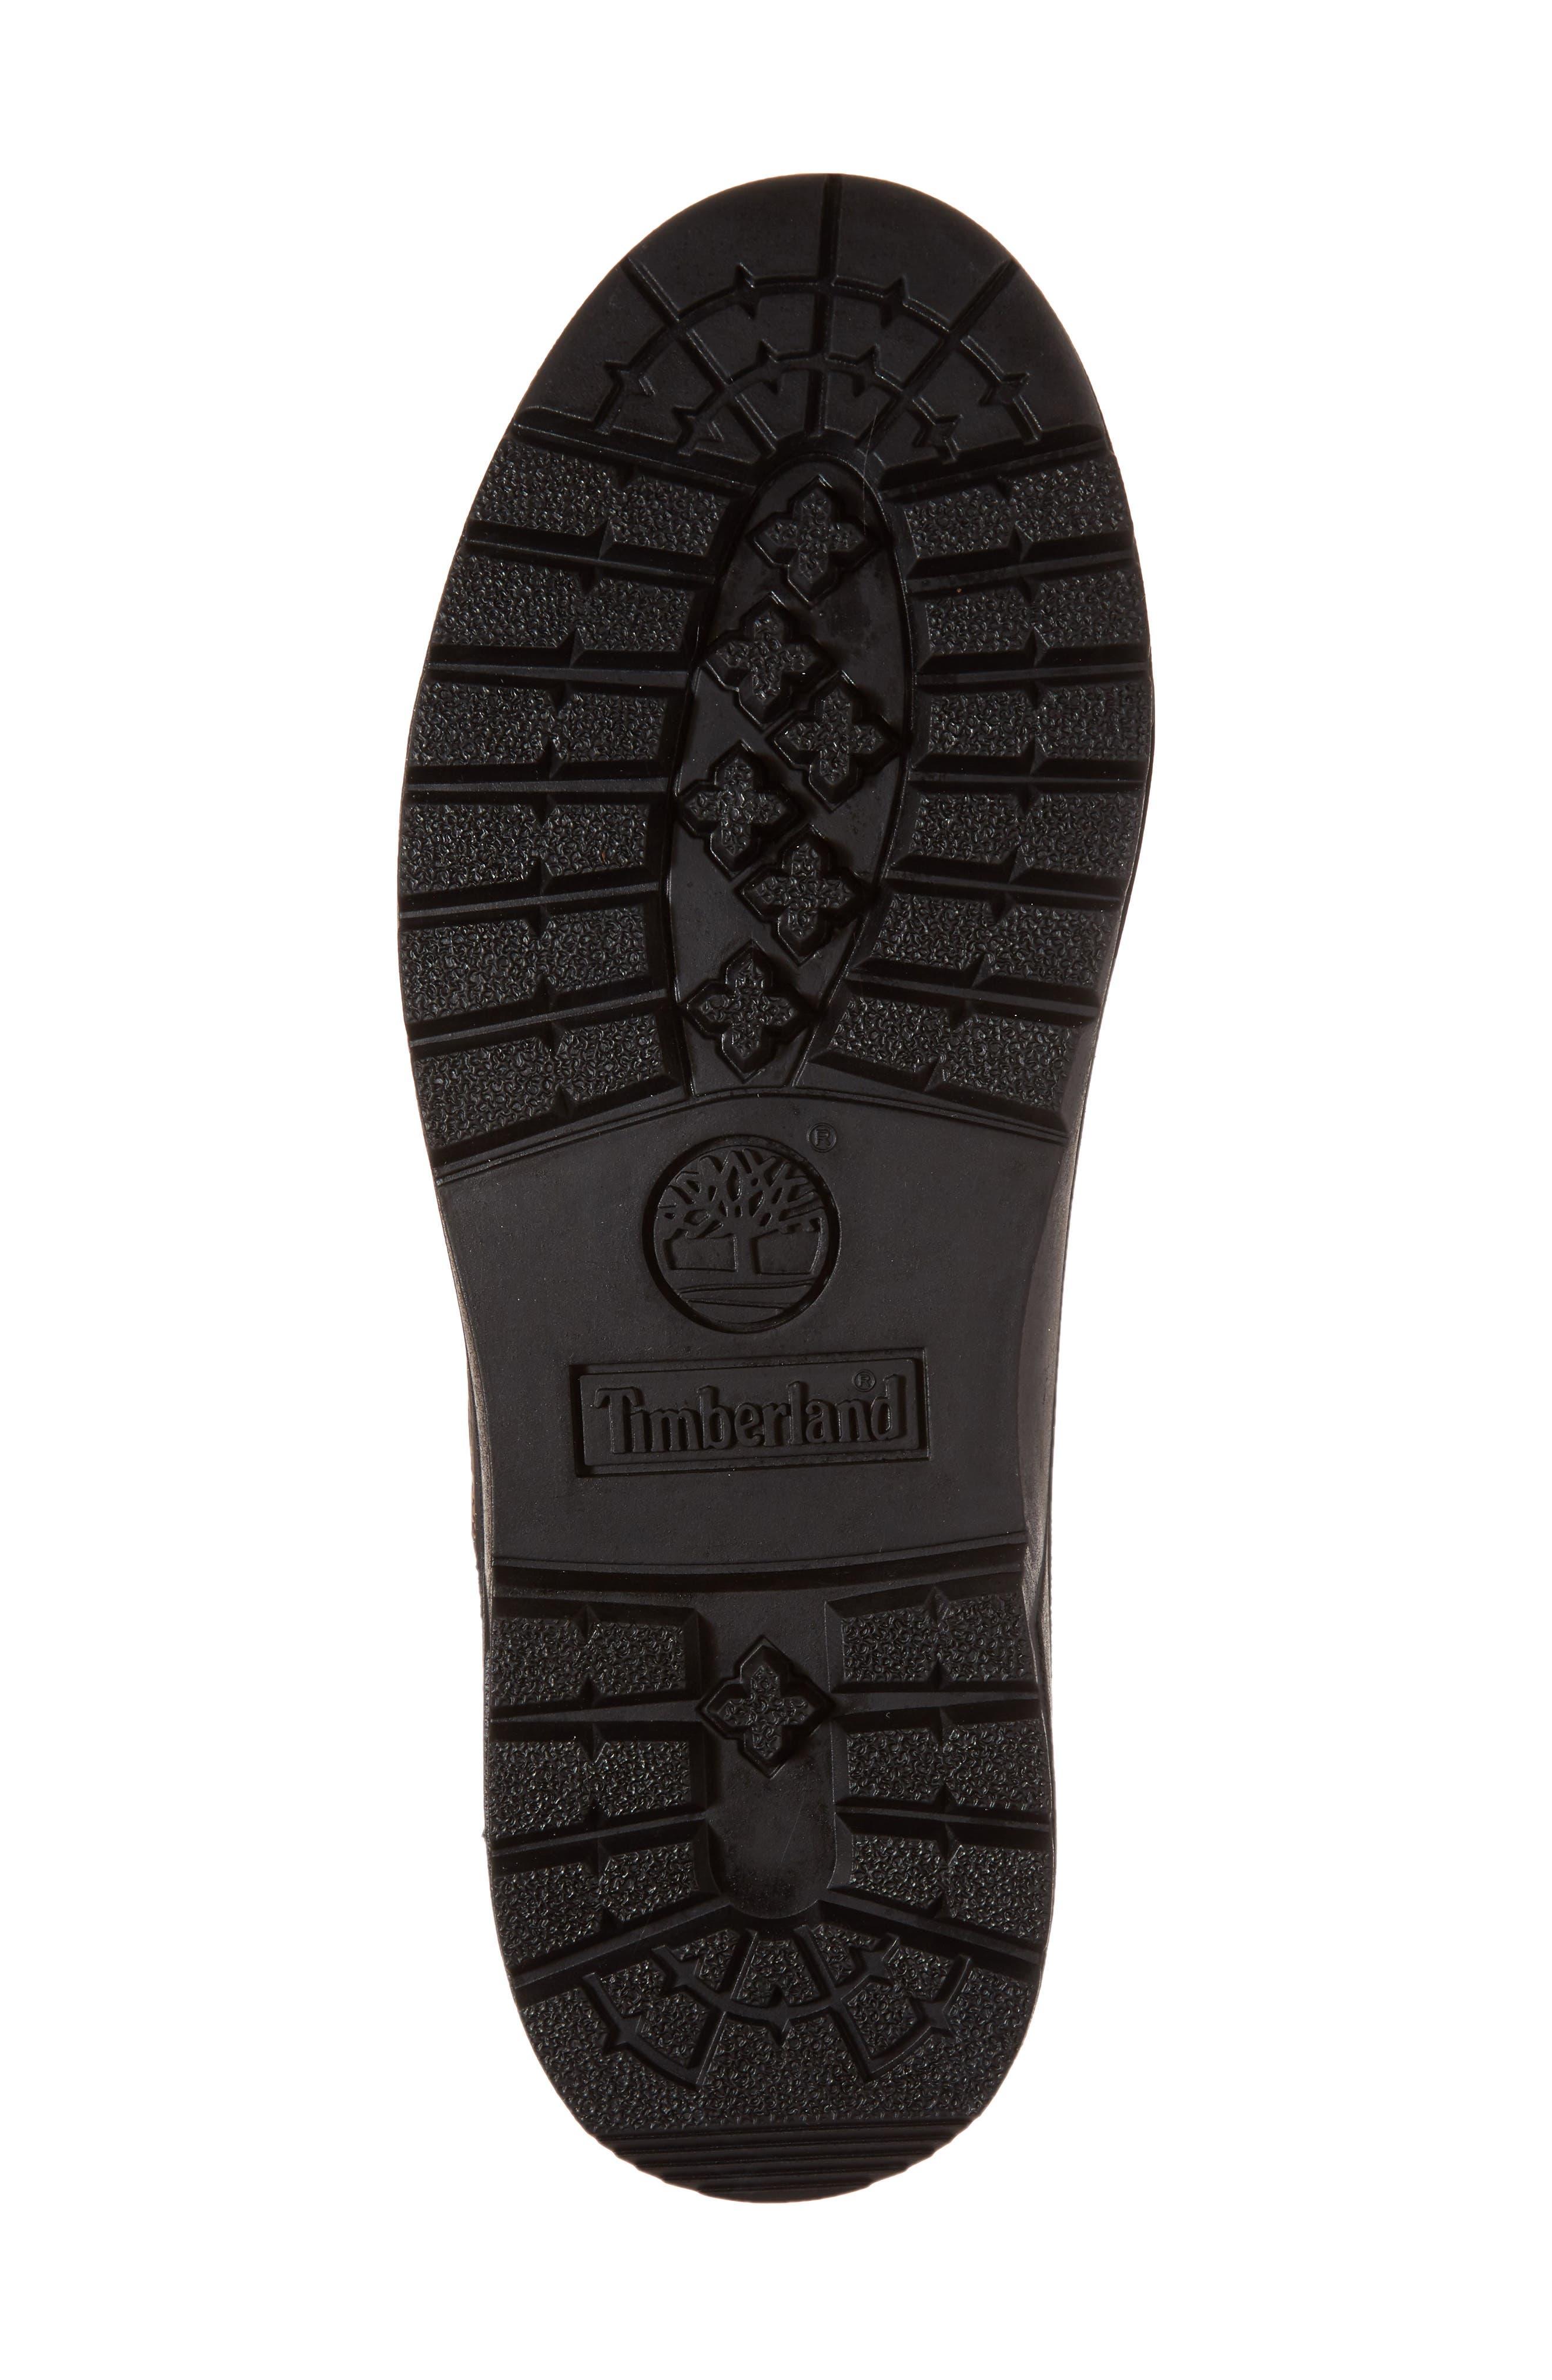 Field Waterproof Winter Boot,                             Alternate thumbnail 6, color,                             Hazel Highway Leather